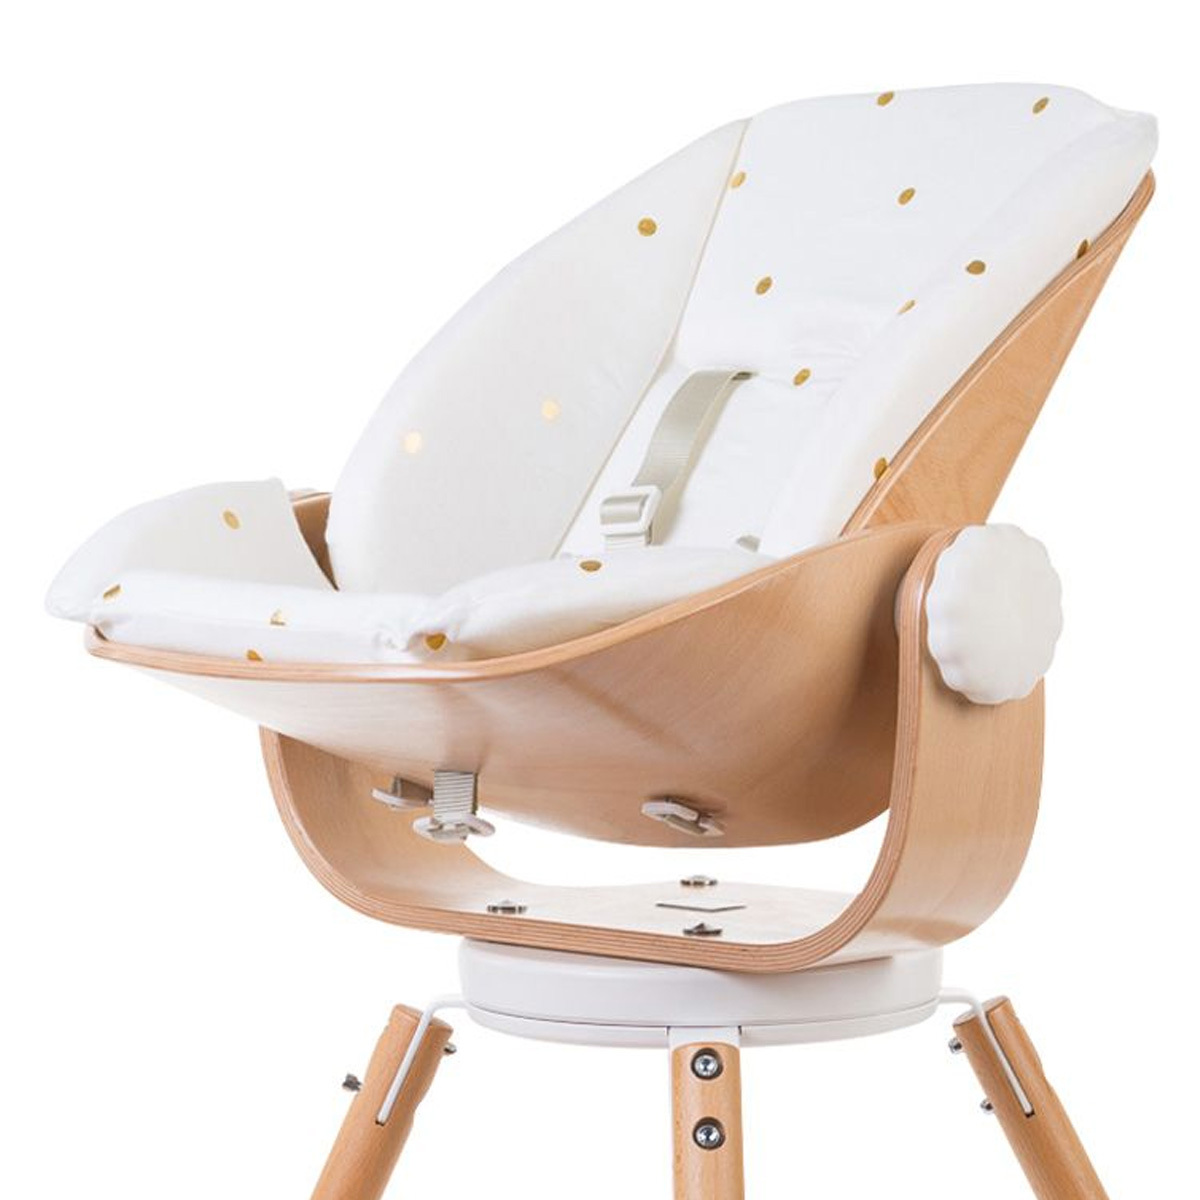 Chaise haute Coussin Evolu Newborn Jersey - Gold Dots Coussin pour Siège Evolu Newborn Jersey - Gold Dots